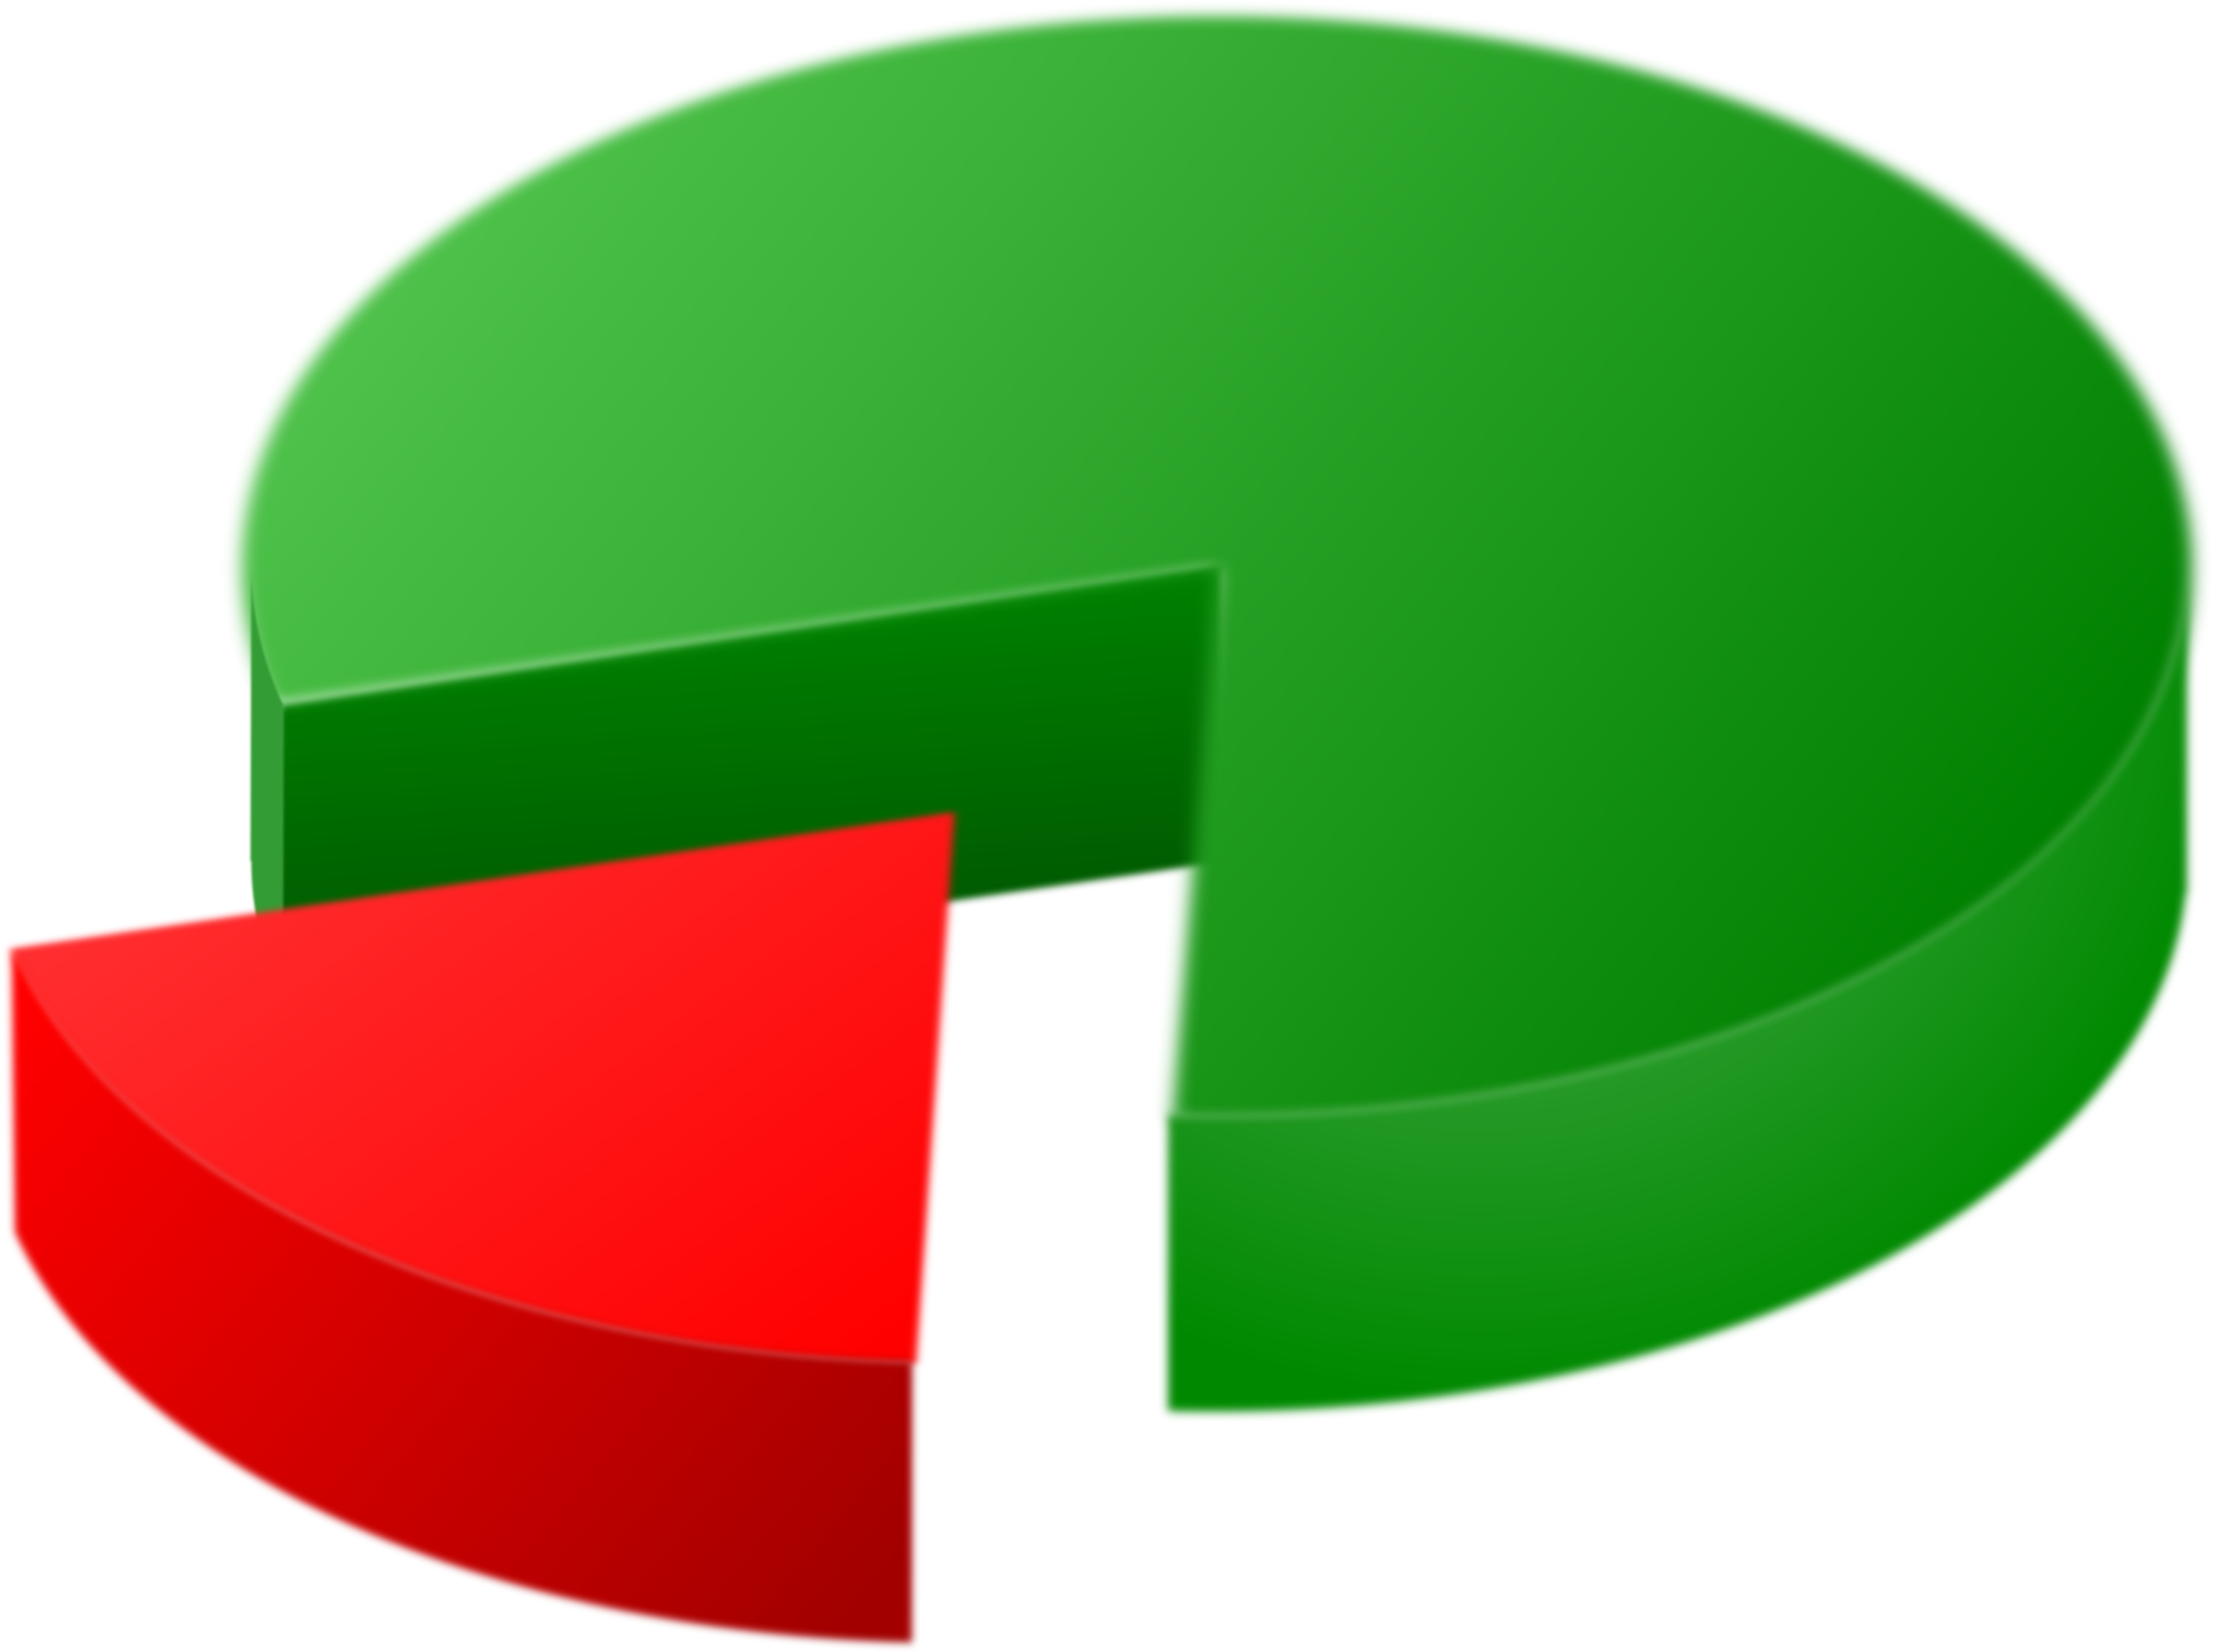 jpg stock Vector chart clipart. Pie graph big image